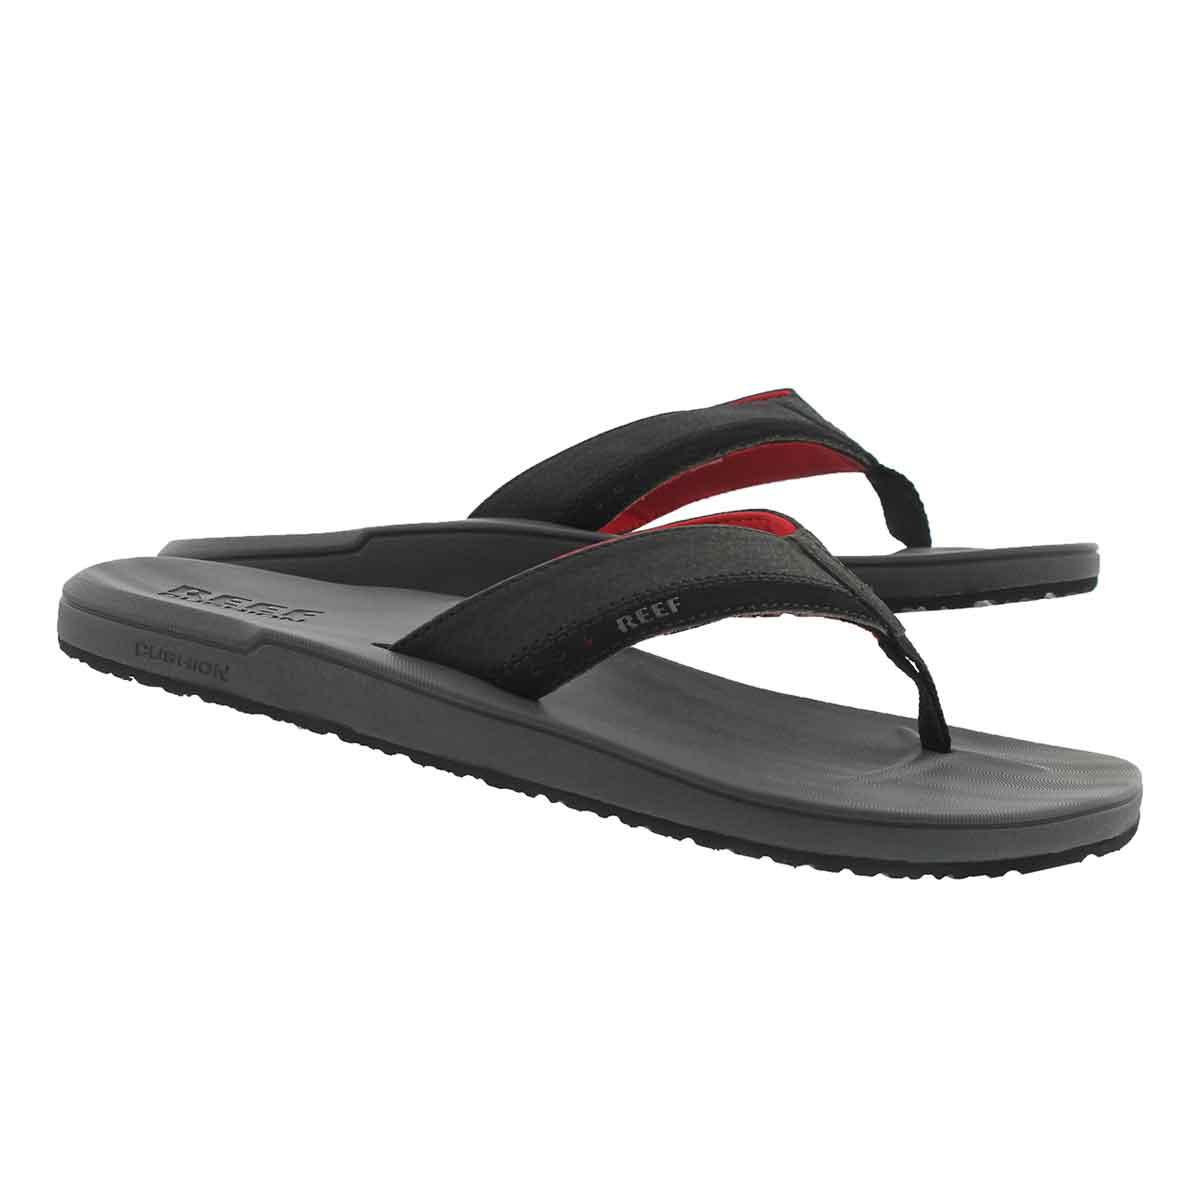 Mns Contoured Cushion gy/rd thong sandal